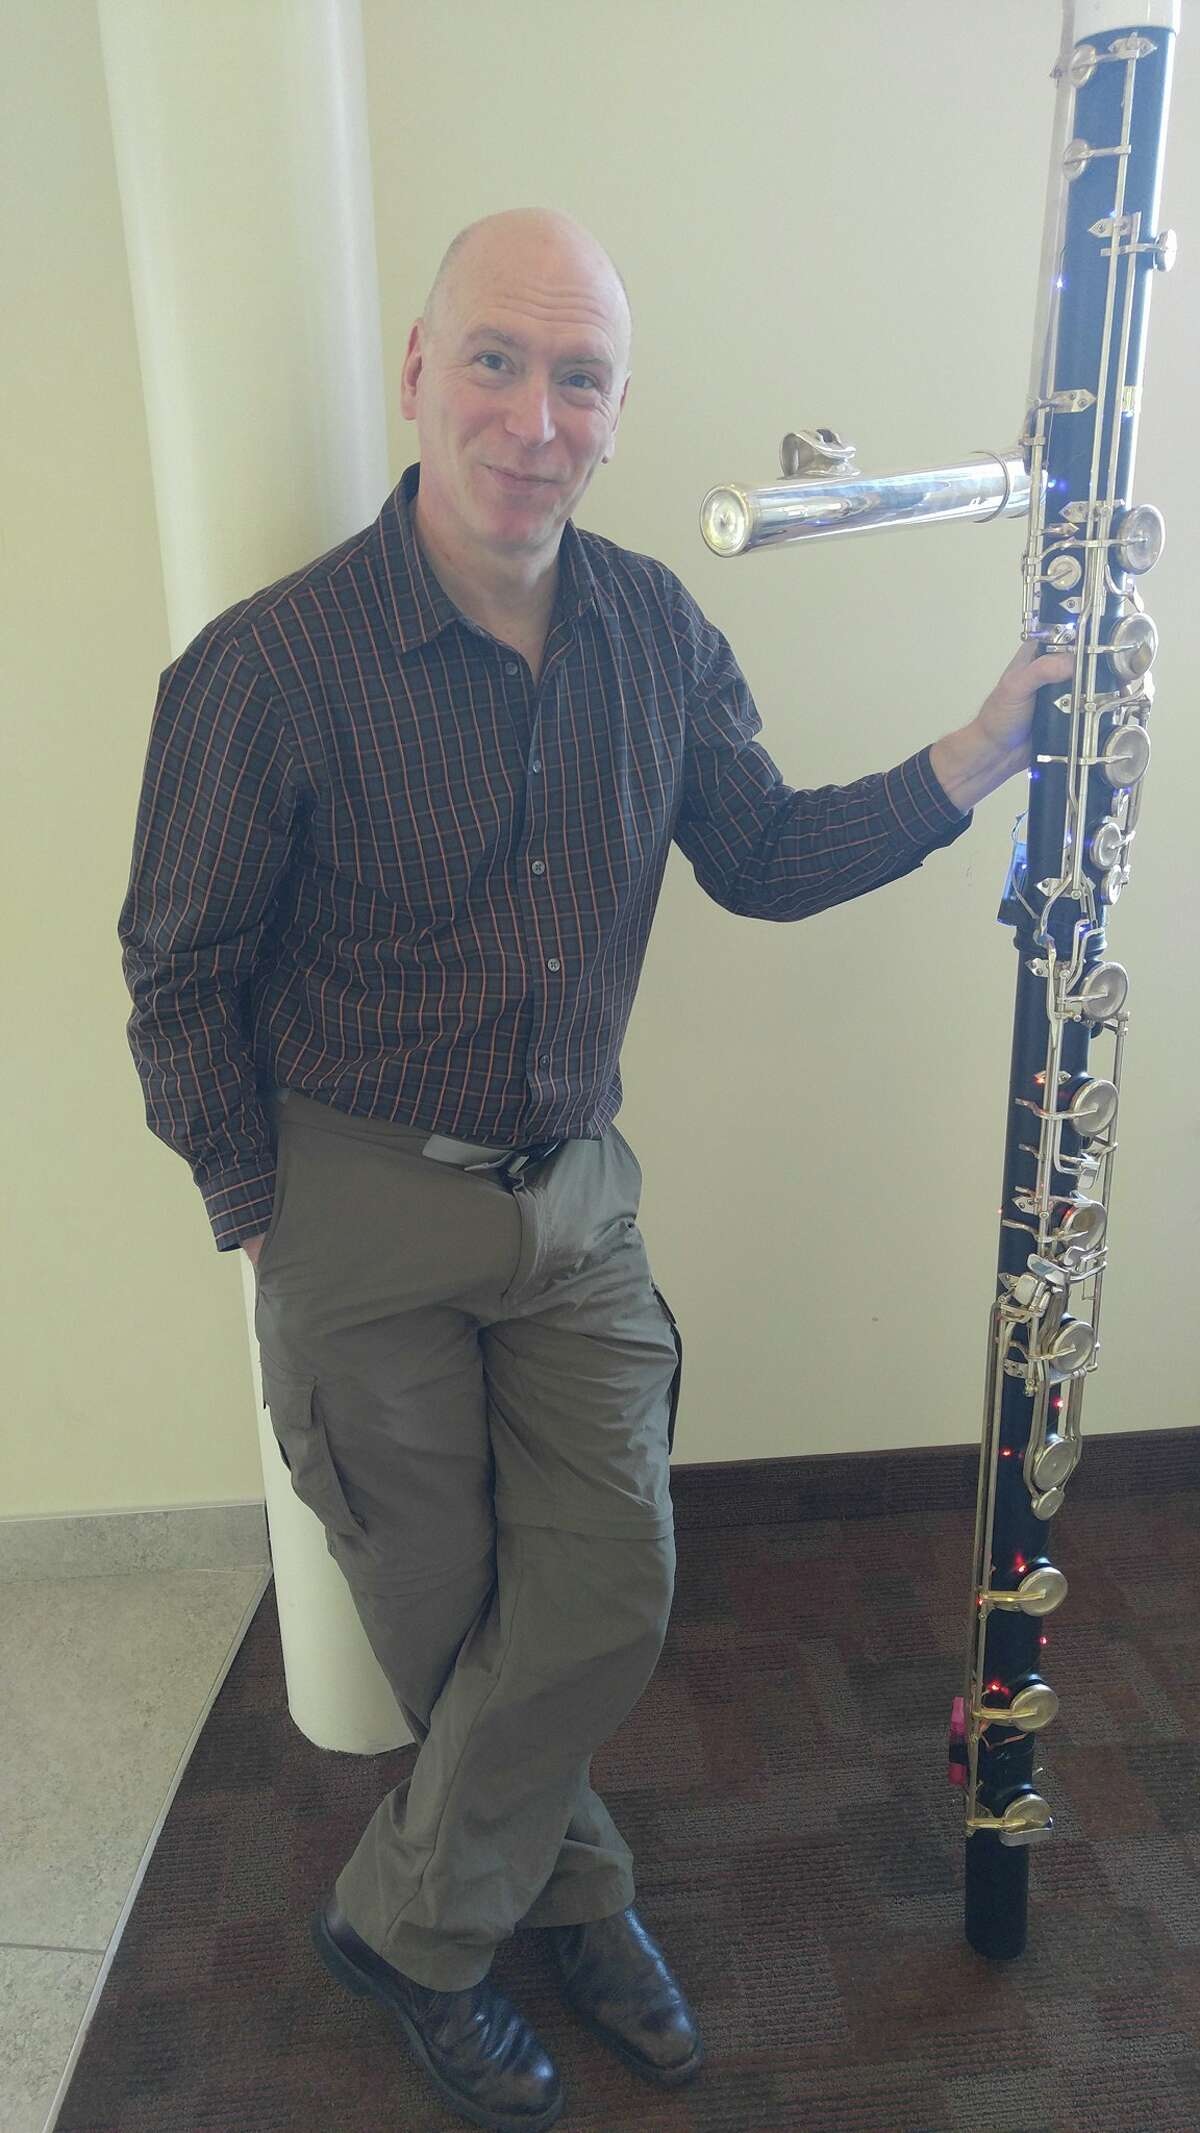 Norman Thibodeau with Hogenhuis contrabass flute - photo credit Graham Wolfe